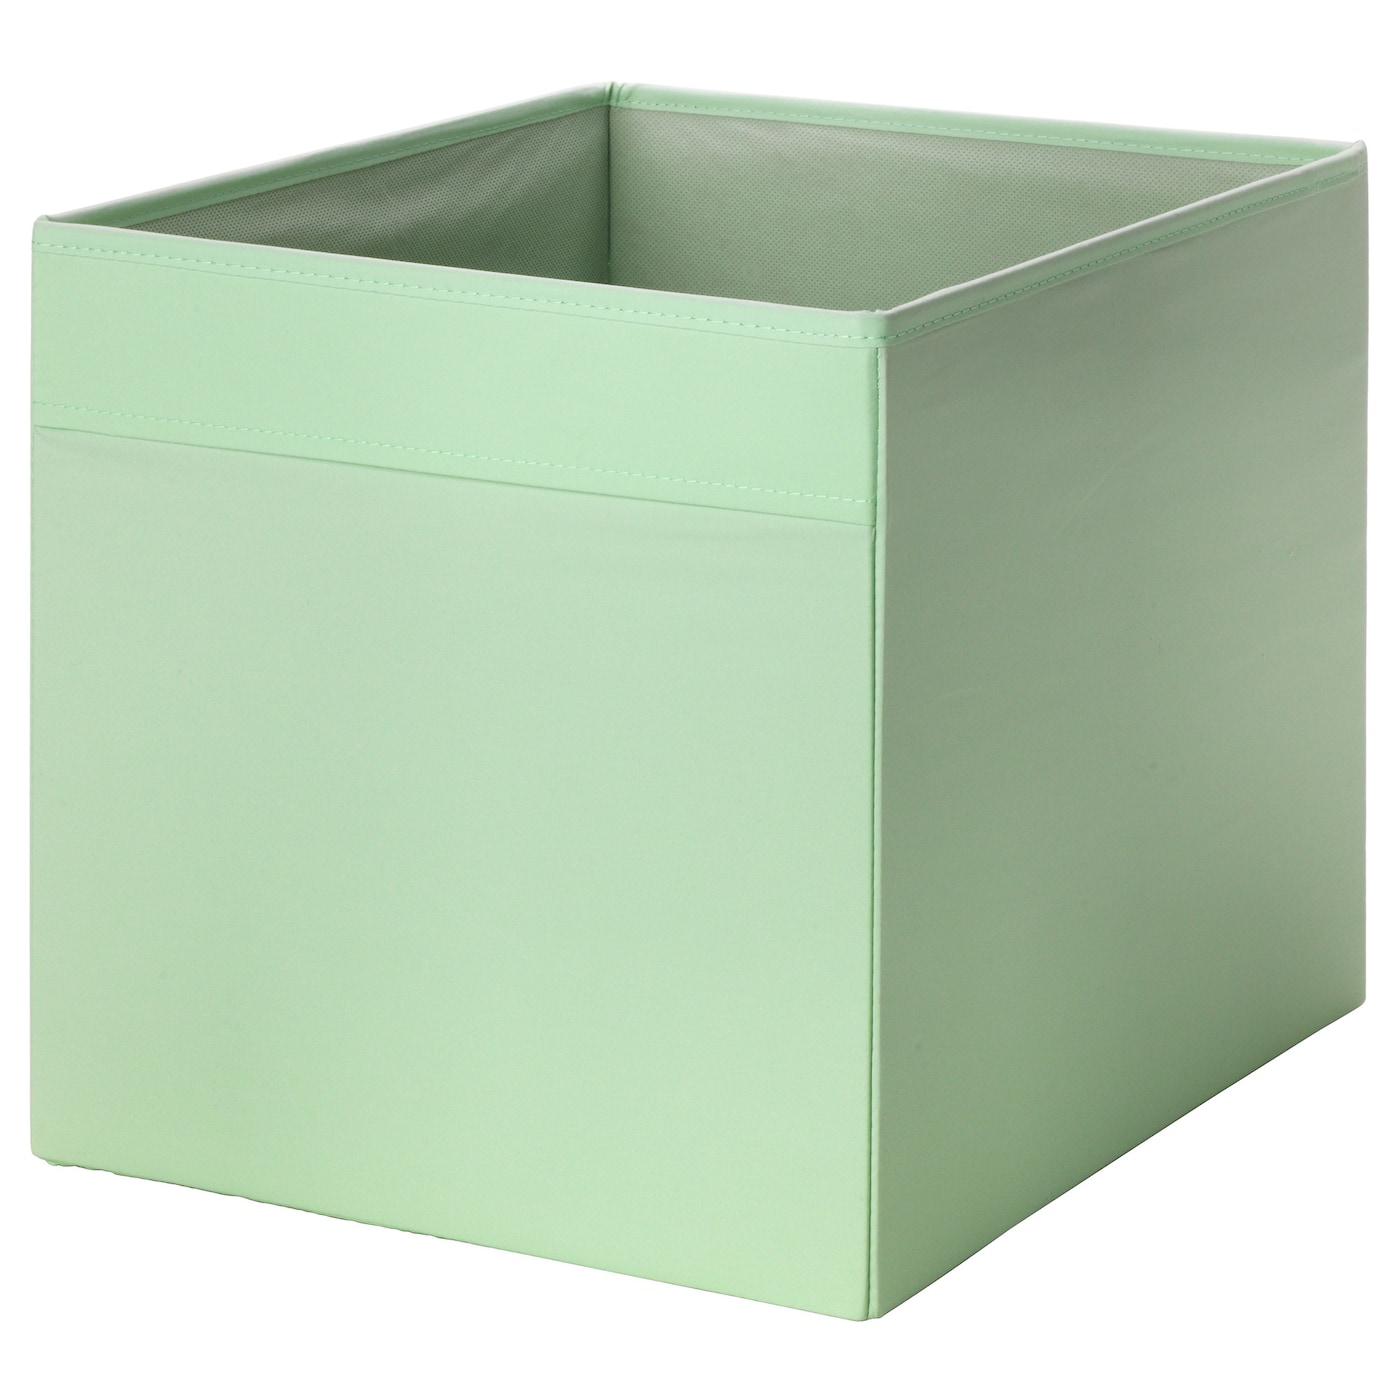 lo n krabice a ko e katalog 2016 n bytek online 20 str nka. Black Bedroom Furniture Sets. Home Design Ideas